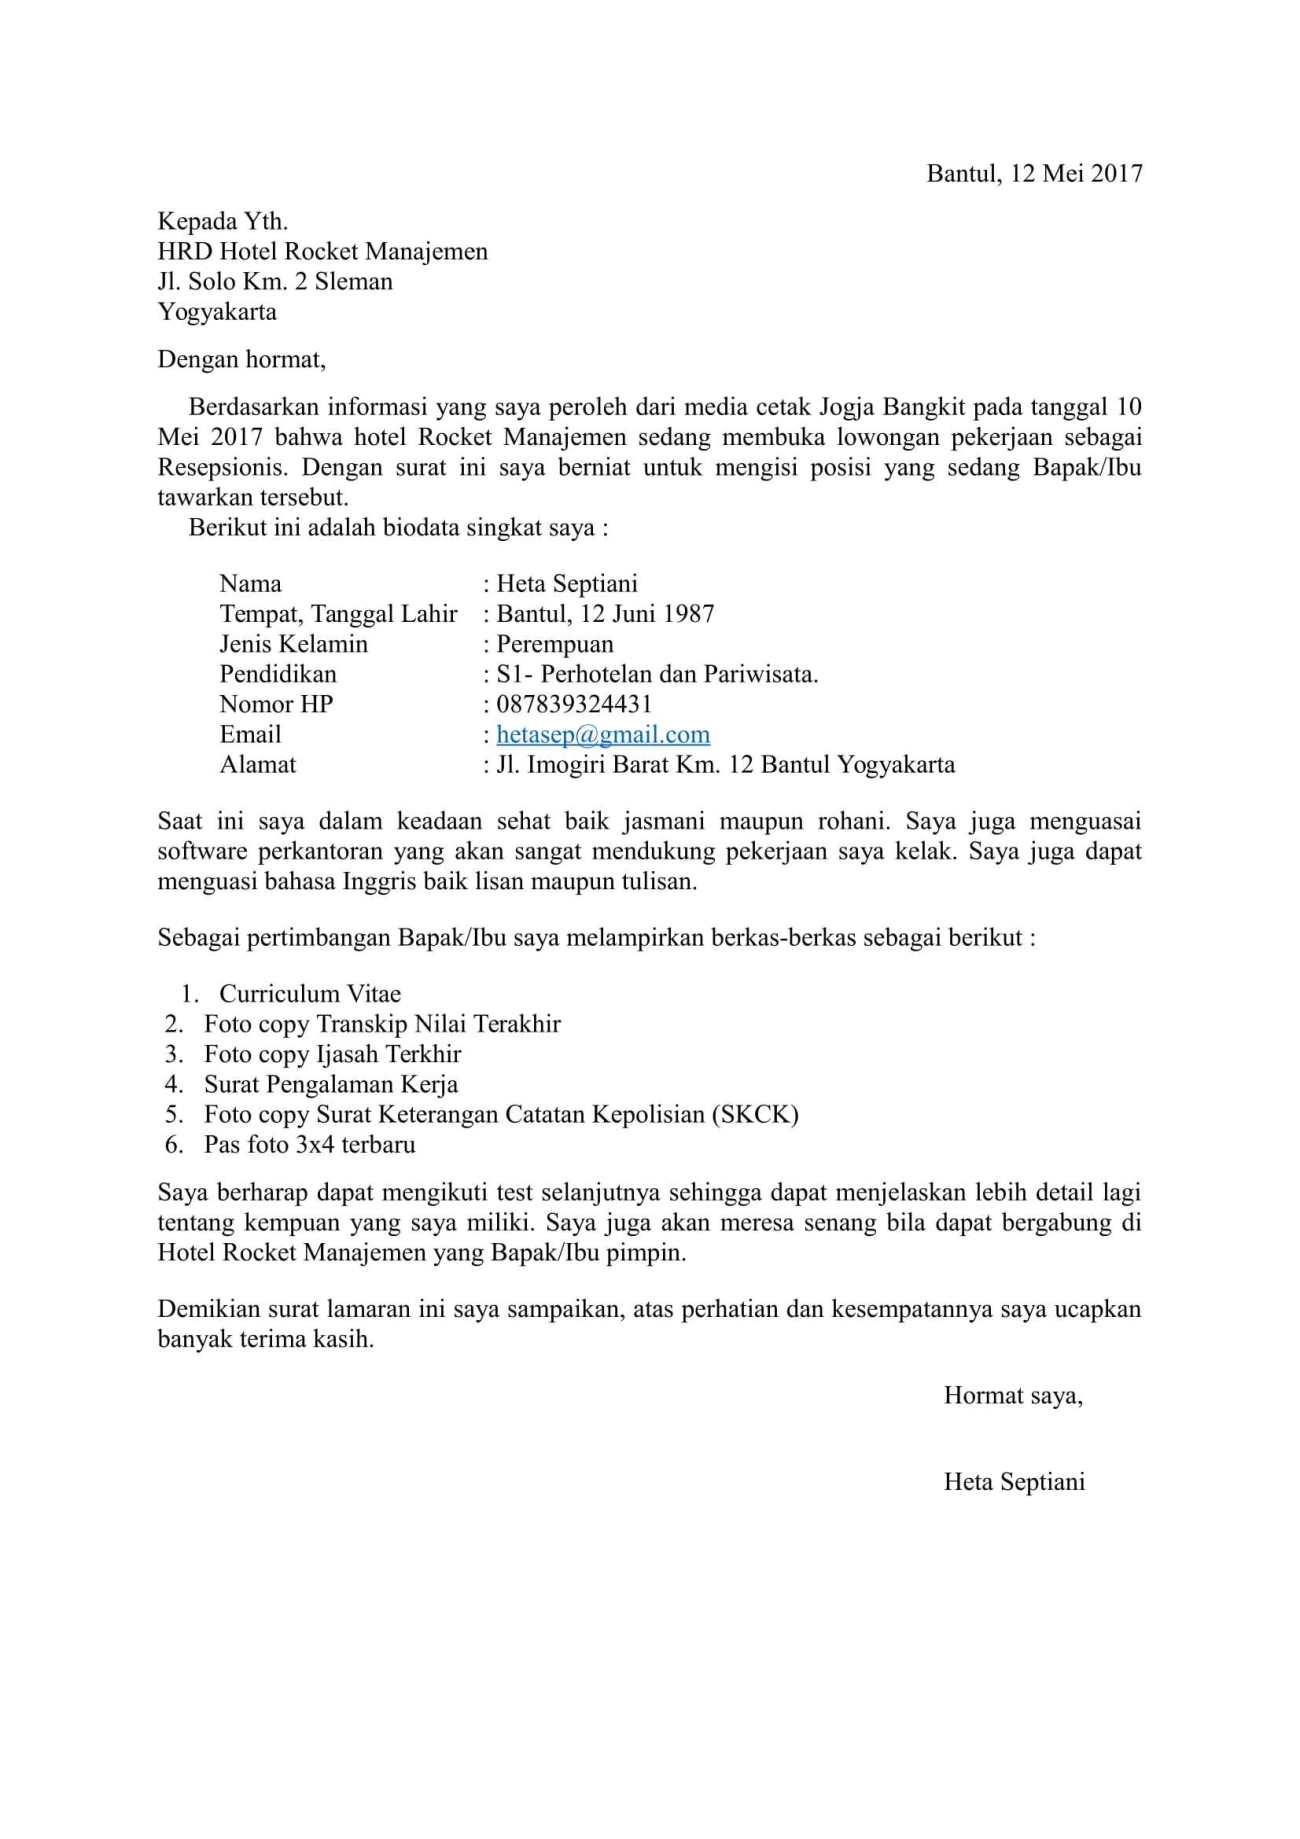 Contoh Surat Lamaran Kerja Umum Menarik Yang Simple Baik Dan Benar